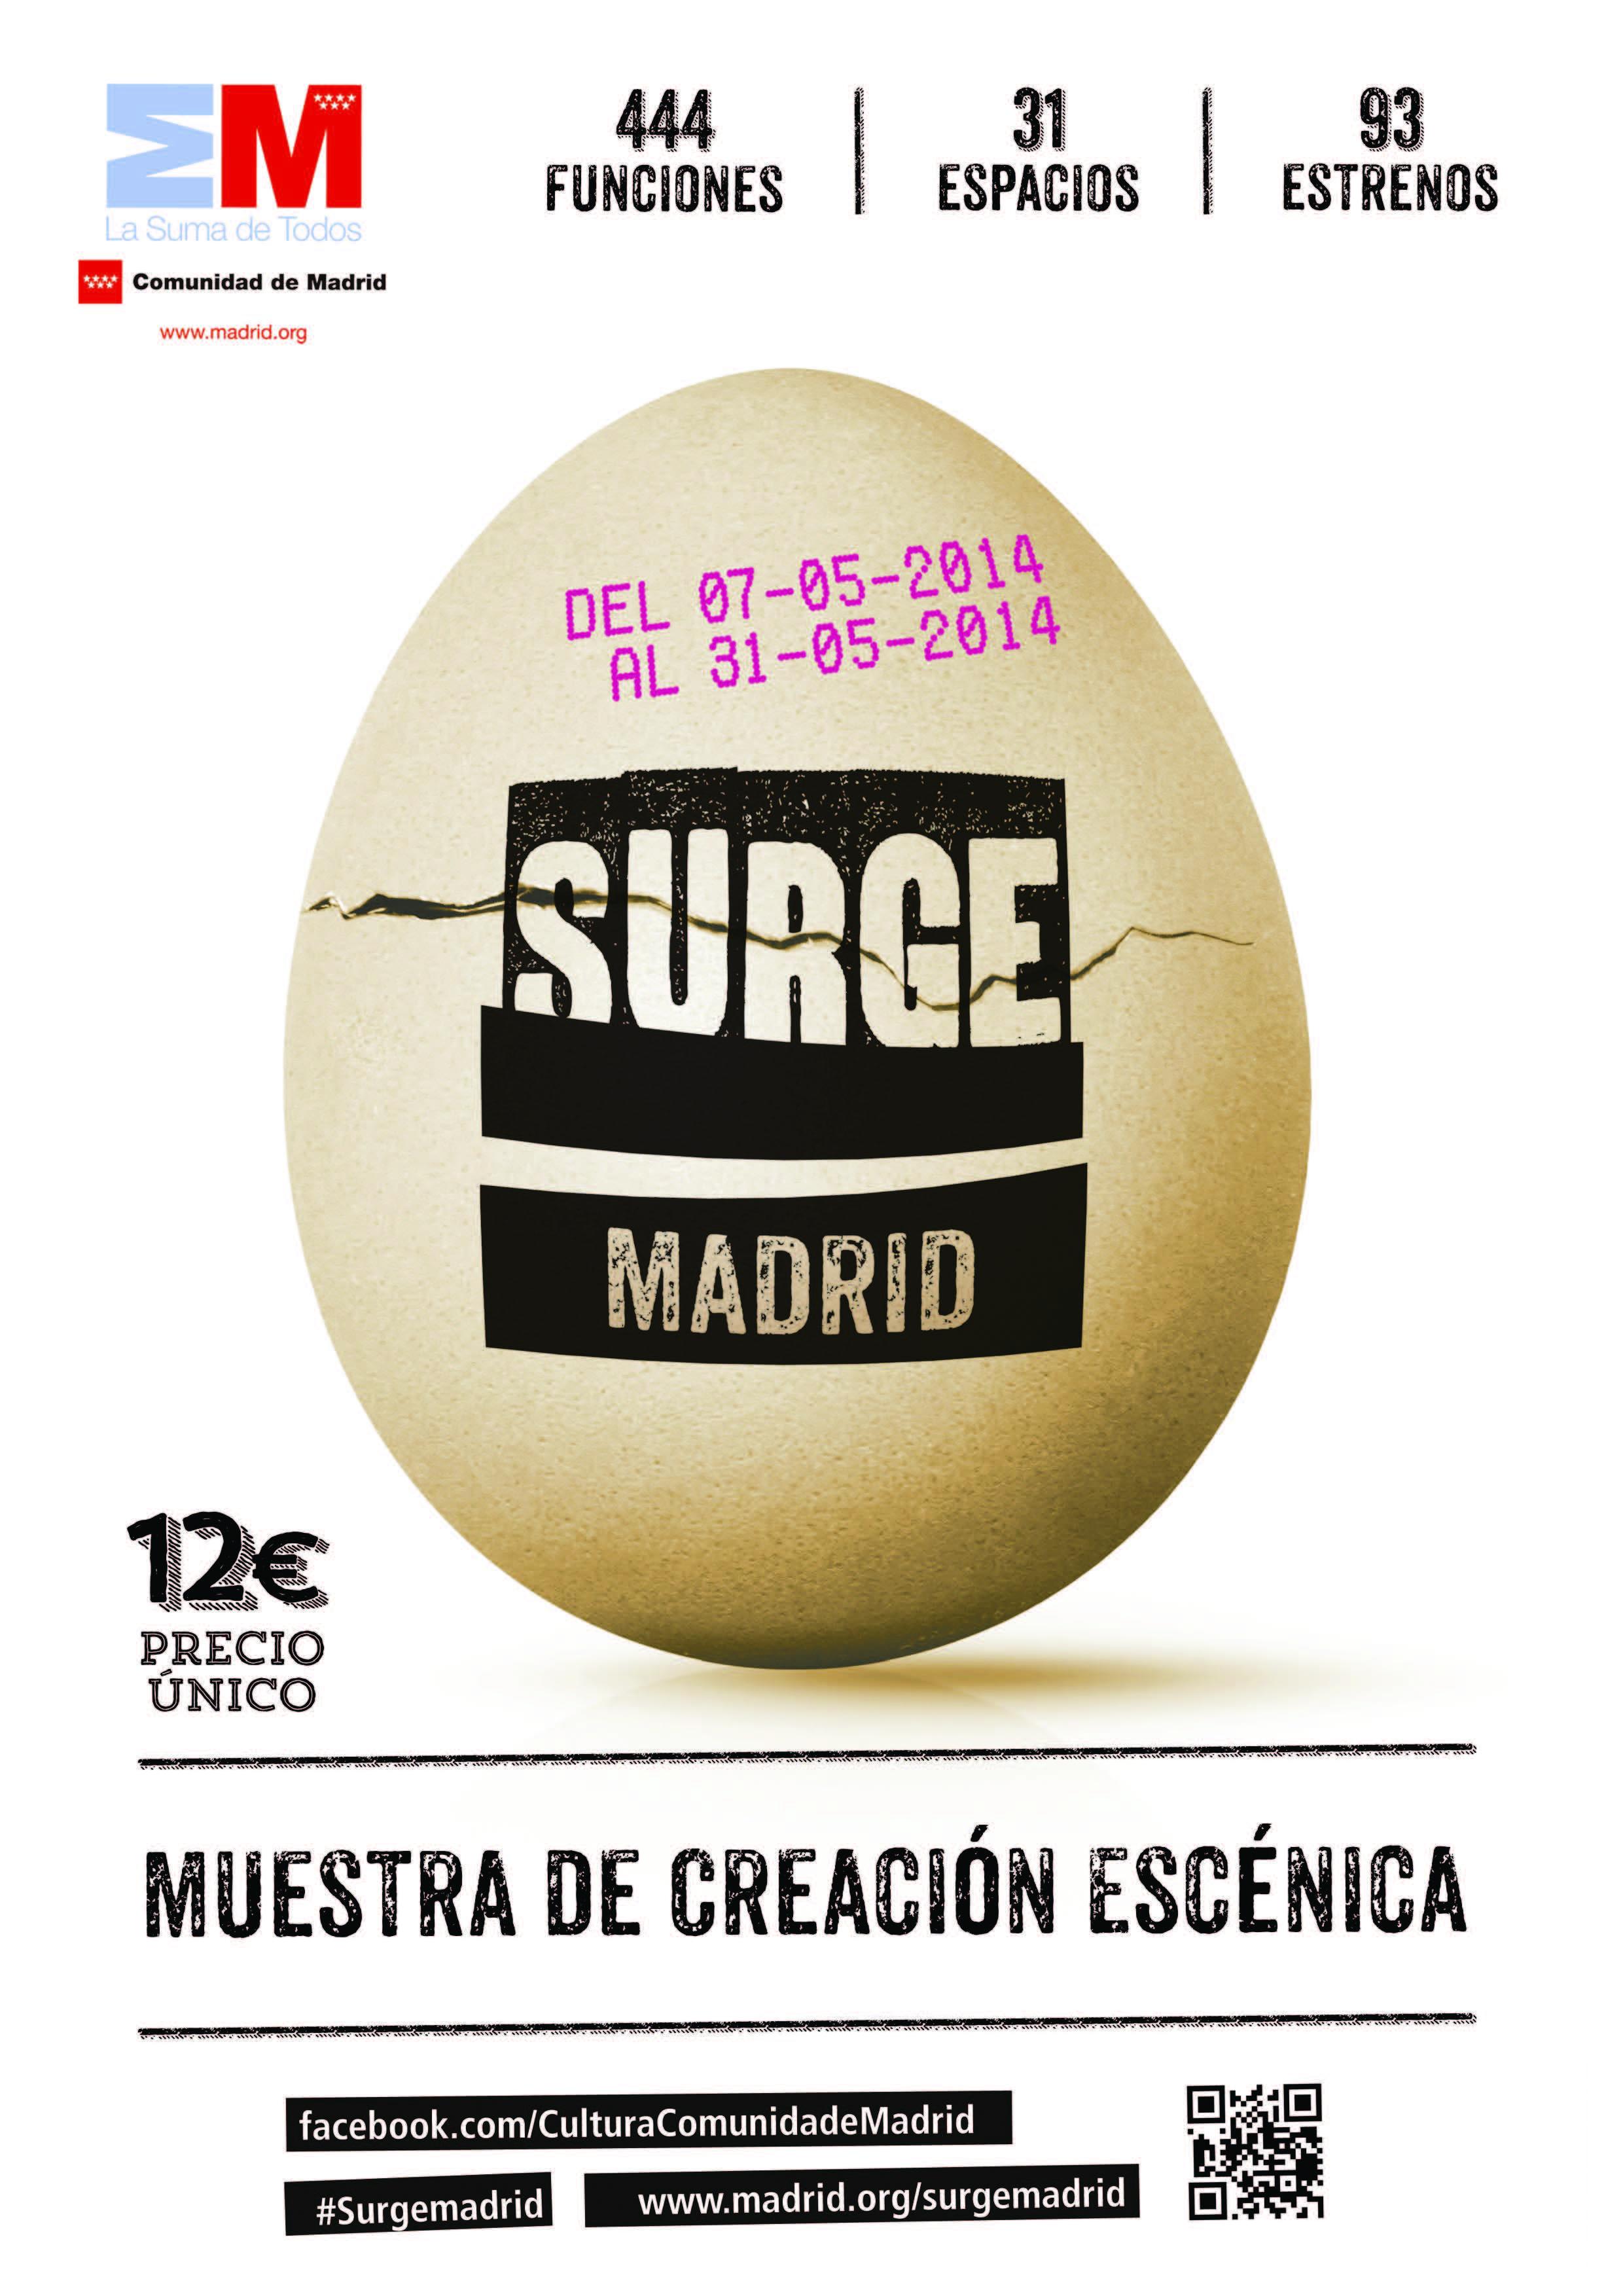 Proinca Mdridfansblog. Teatro Surge en Madrid